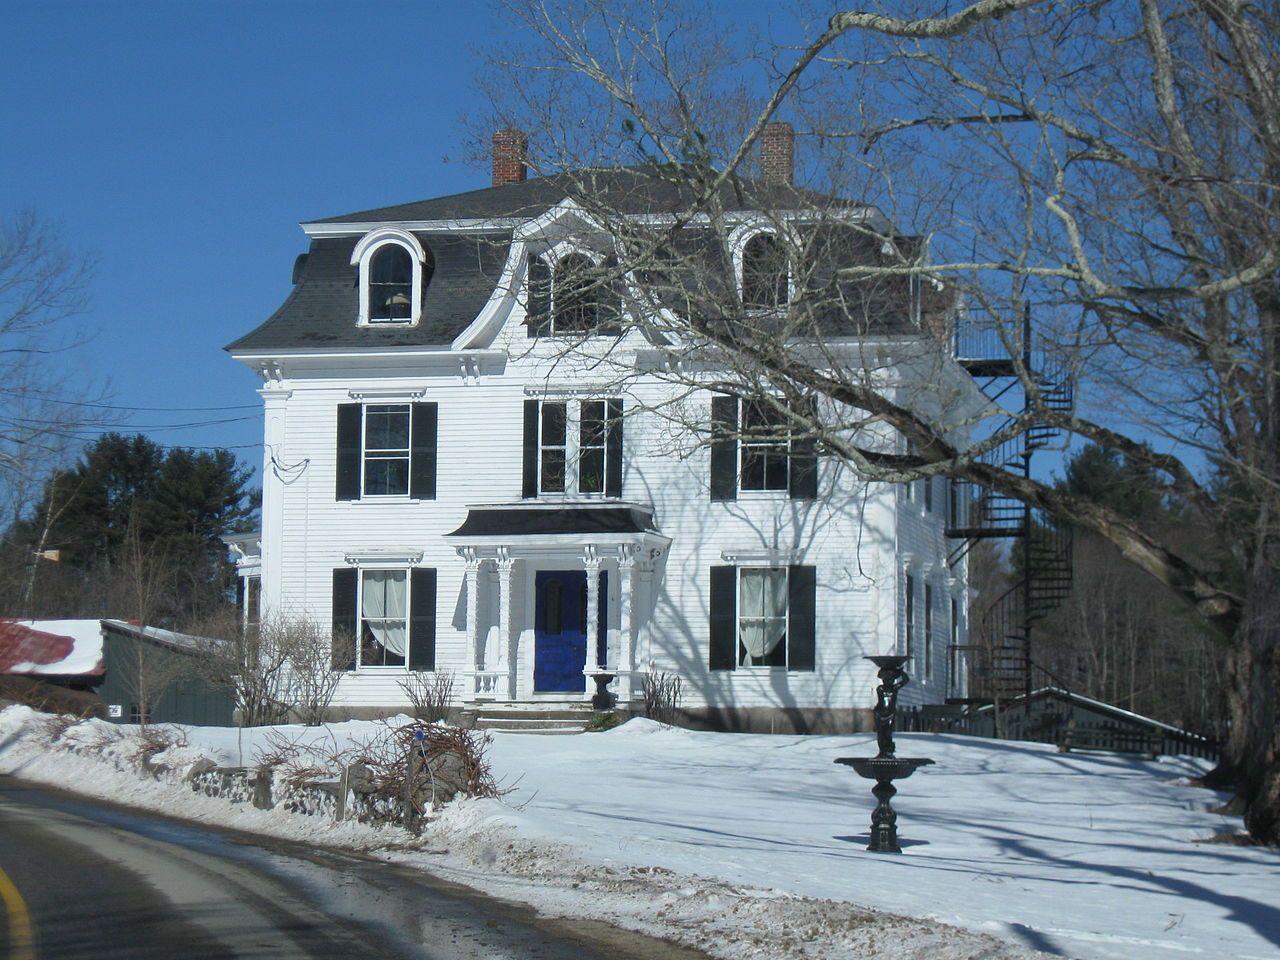 Benjamin franklin prescott house in rockingham county new